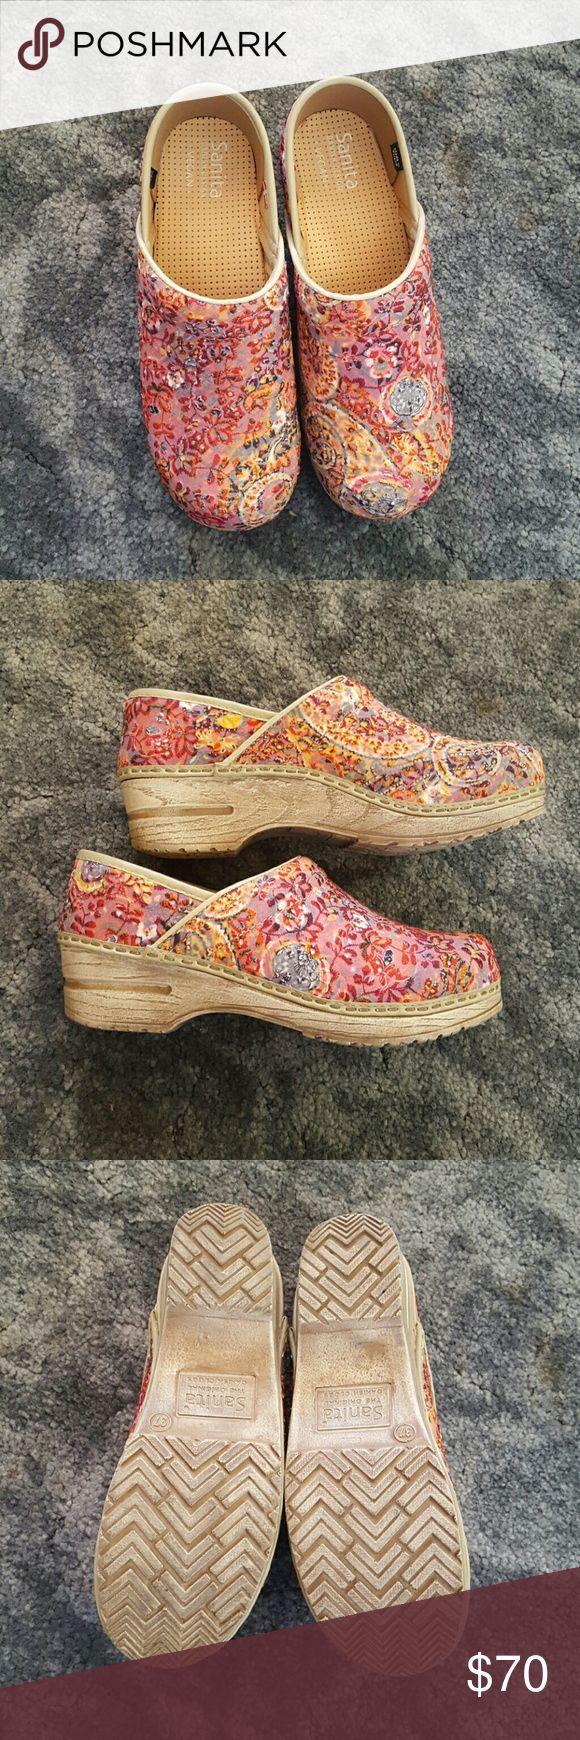 Selling this Sanita clogs on Poshmark! My username is: mdionnel. #shopmycloset #poshmark #fashion #shopping #style #forsale #sanita #Shoes